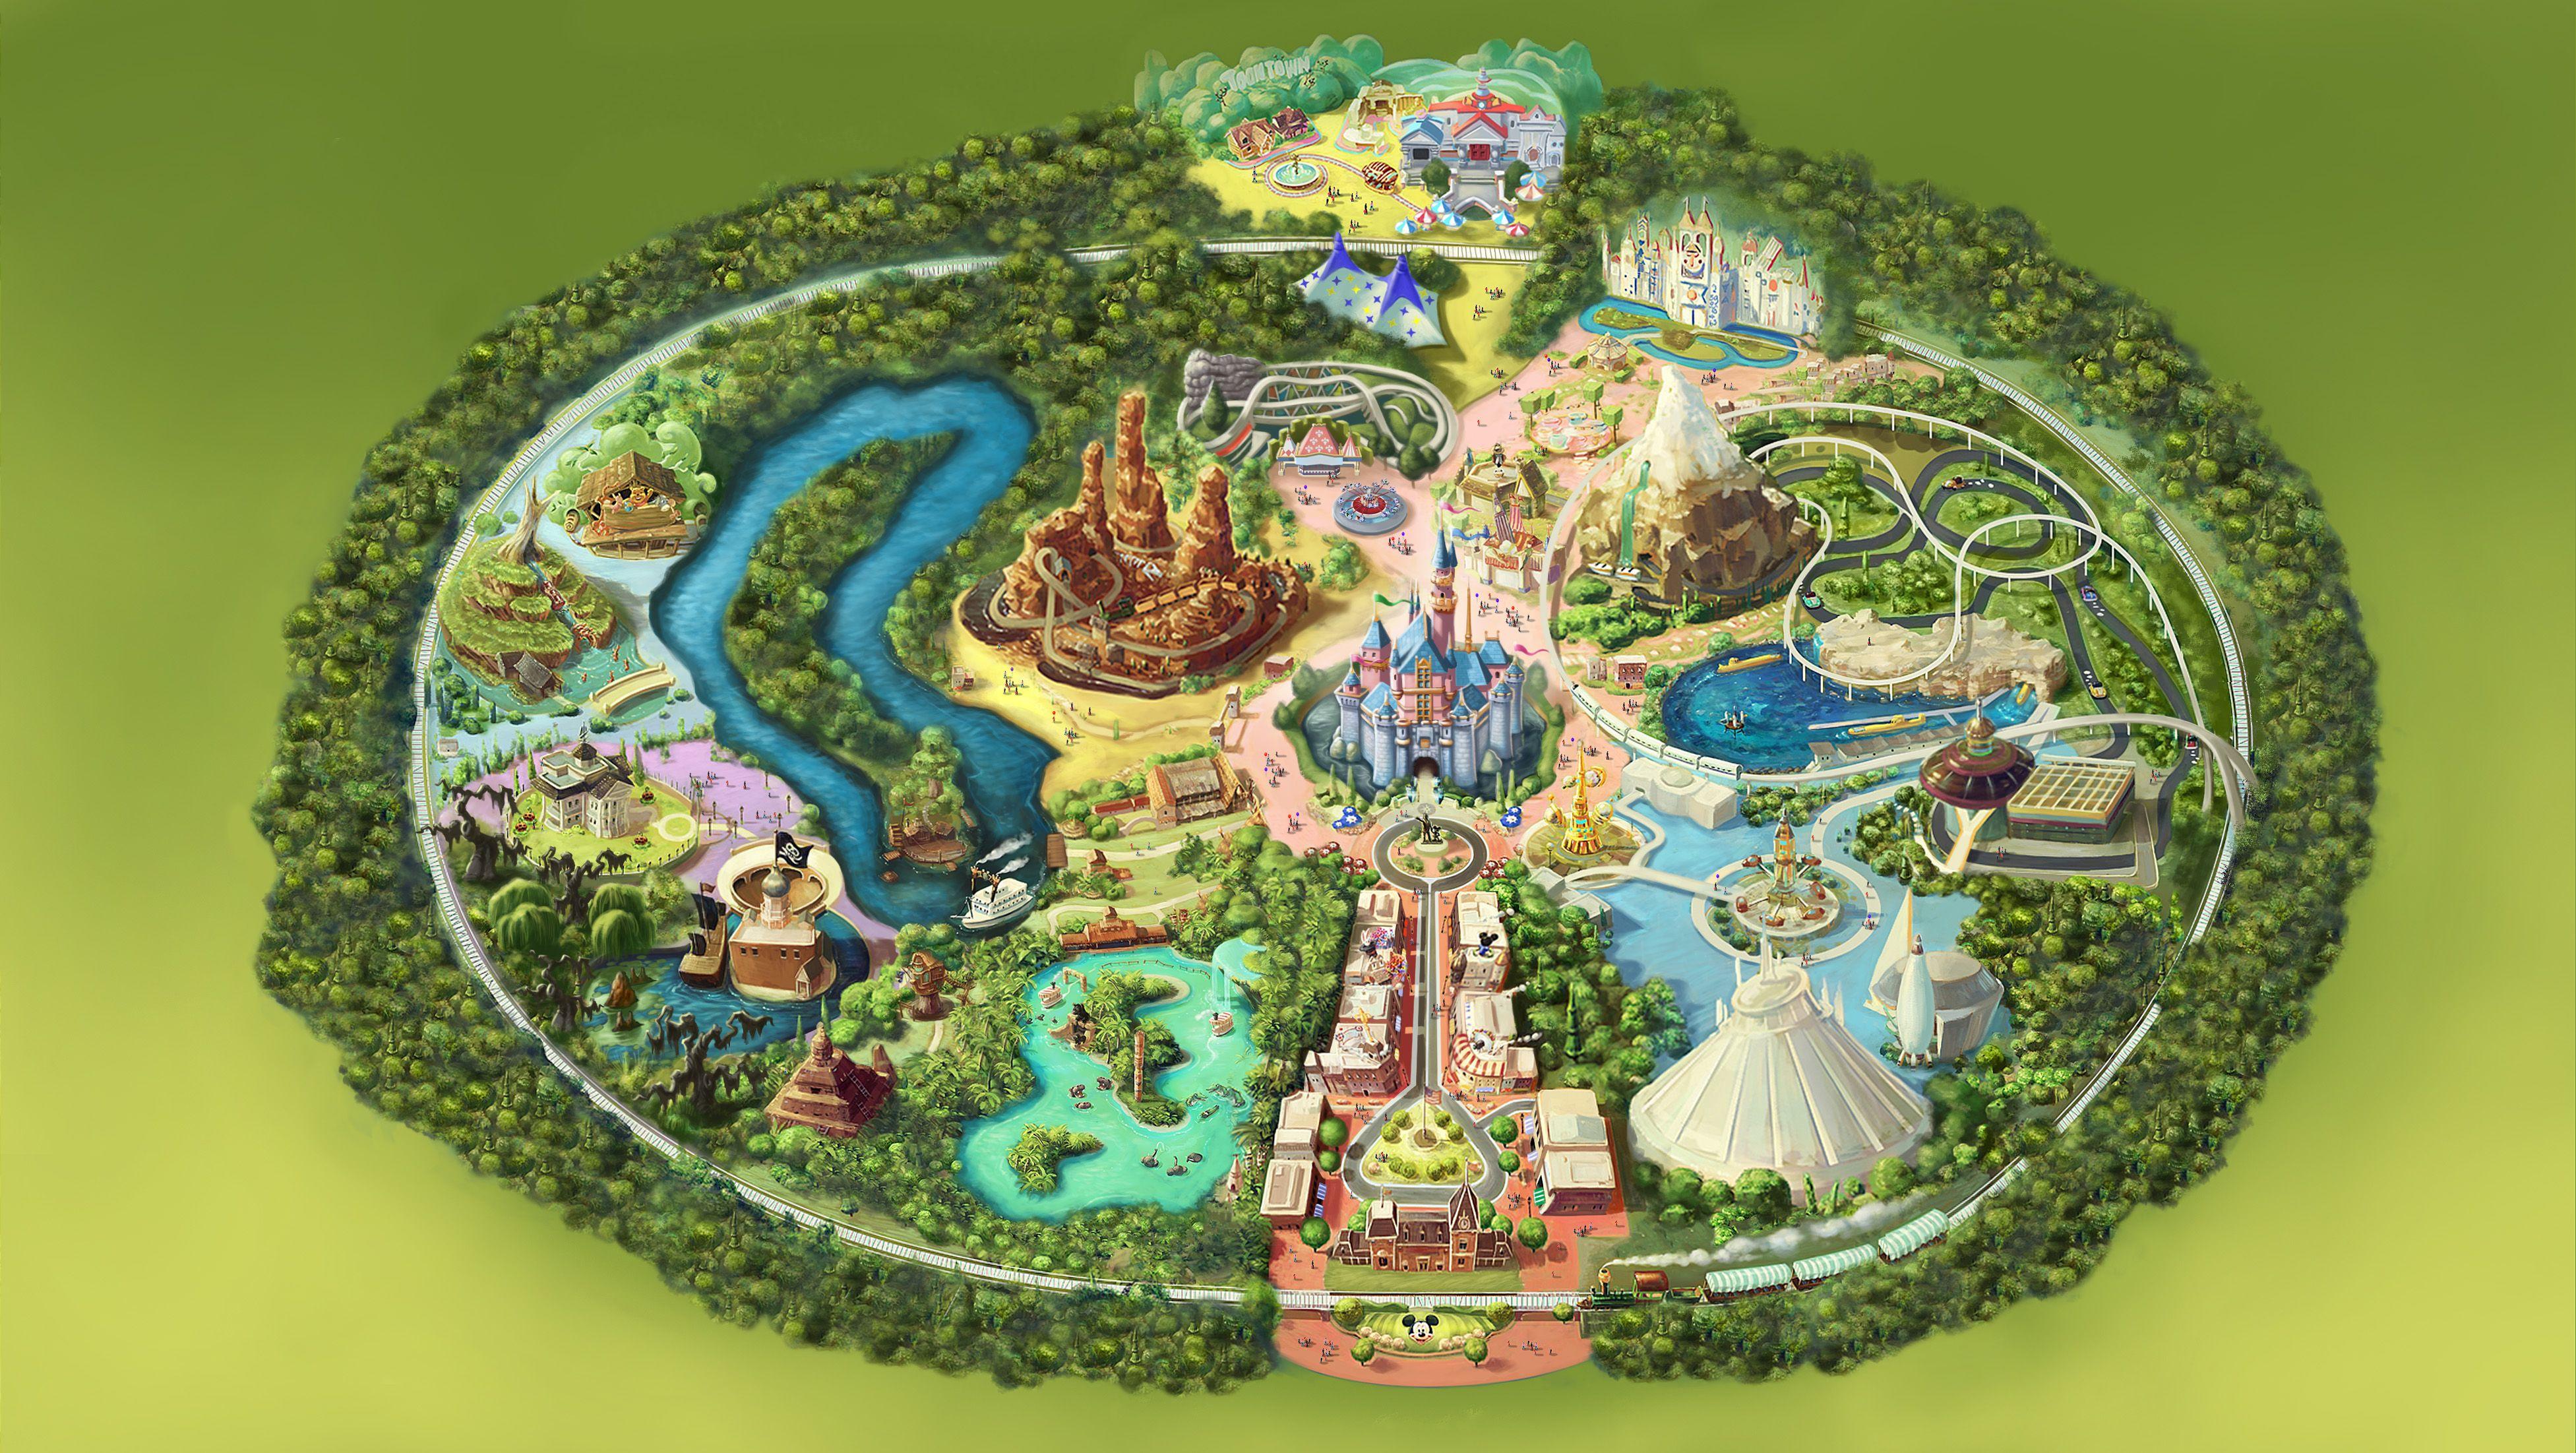 Kinect Disneyland Adventures park map Kinect Disneyland